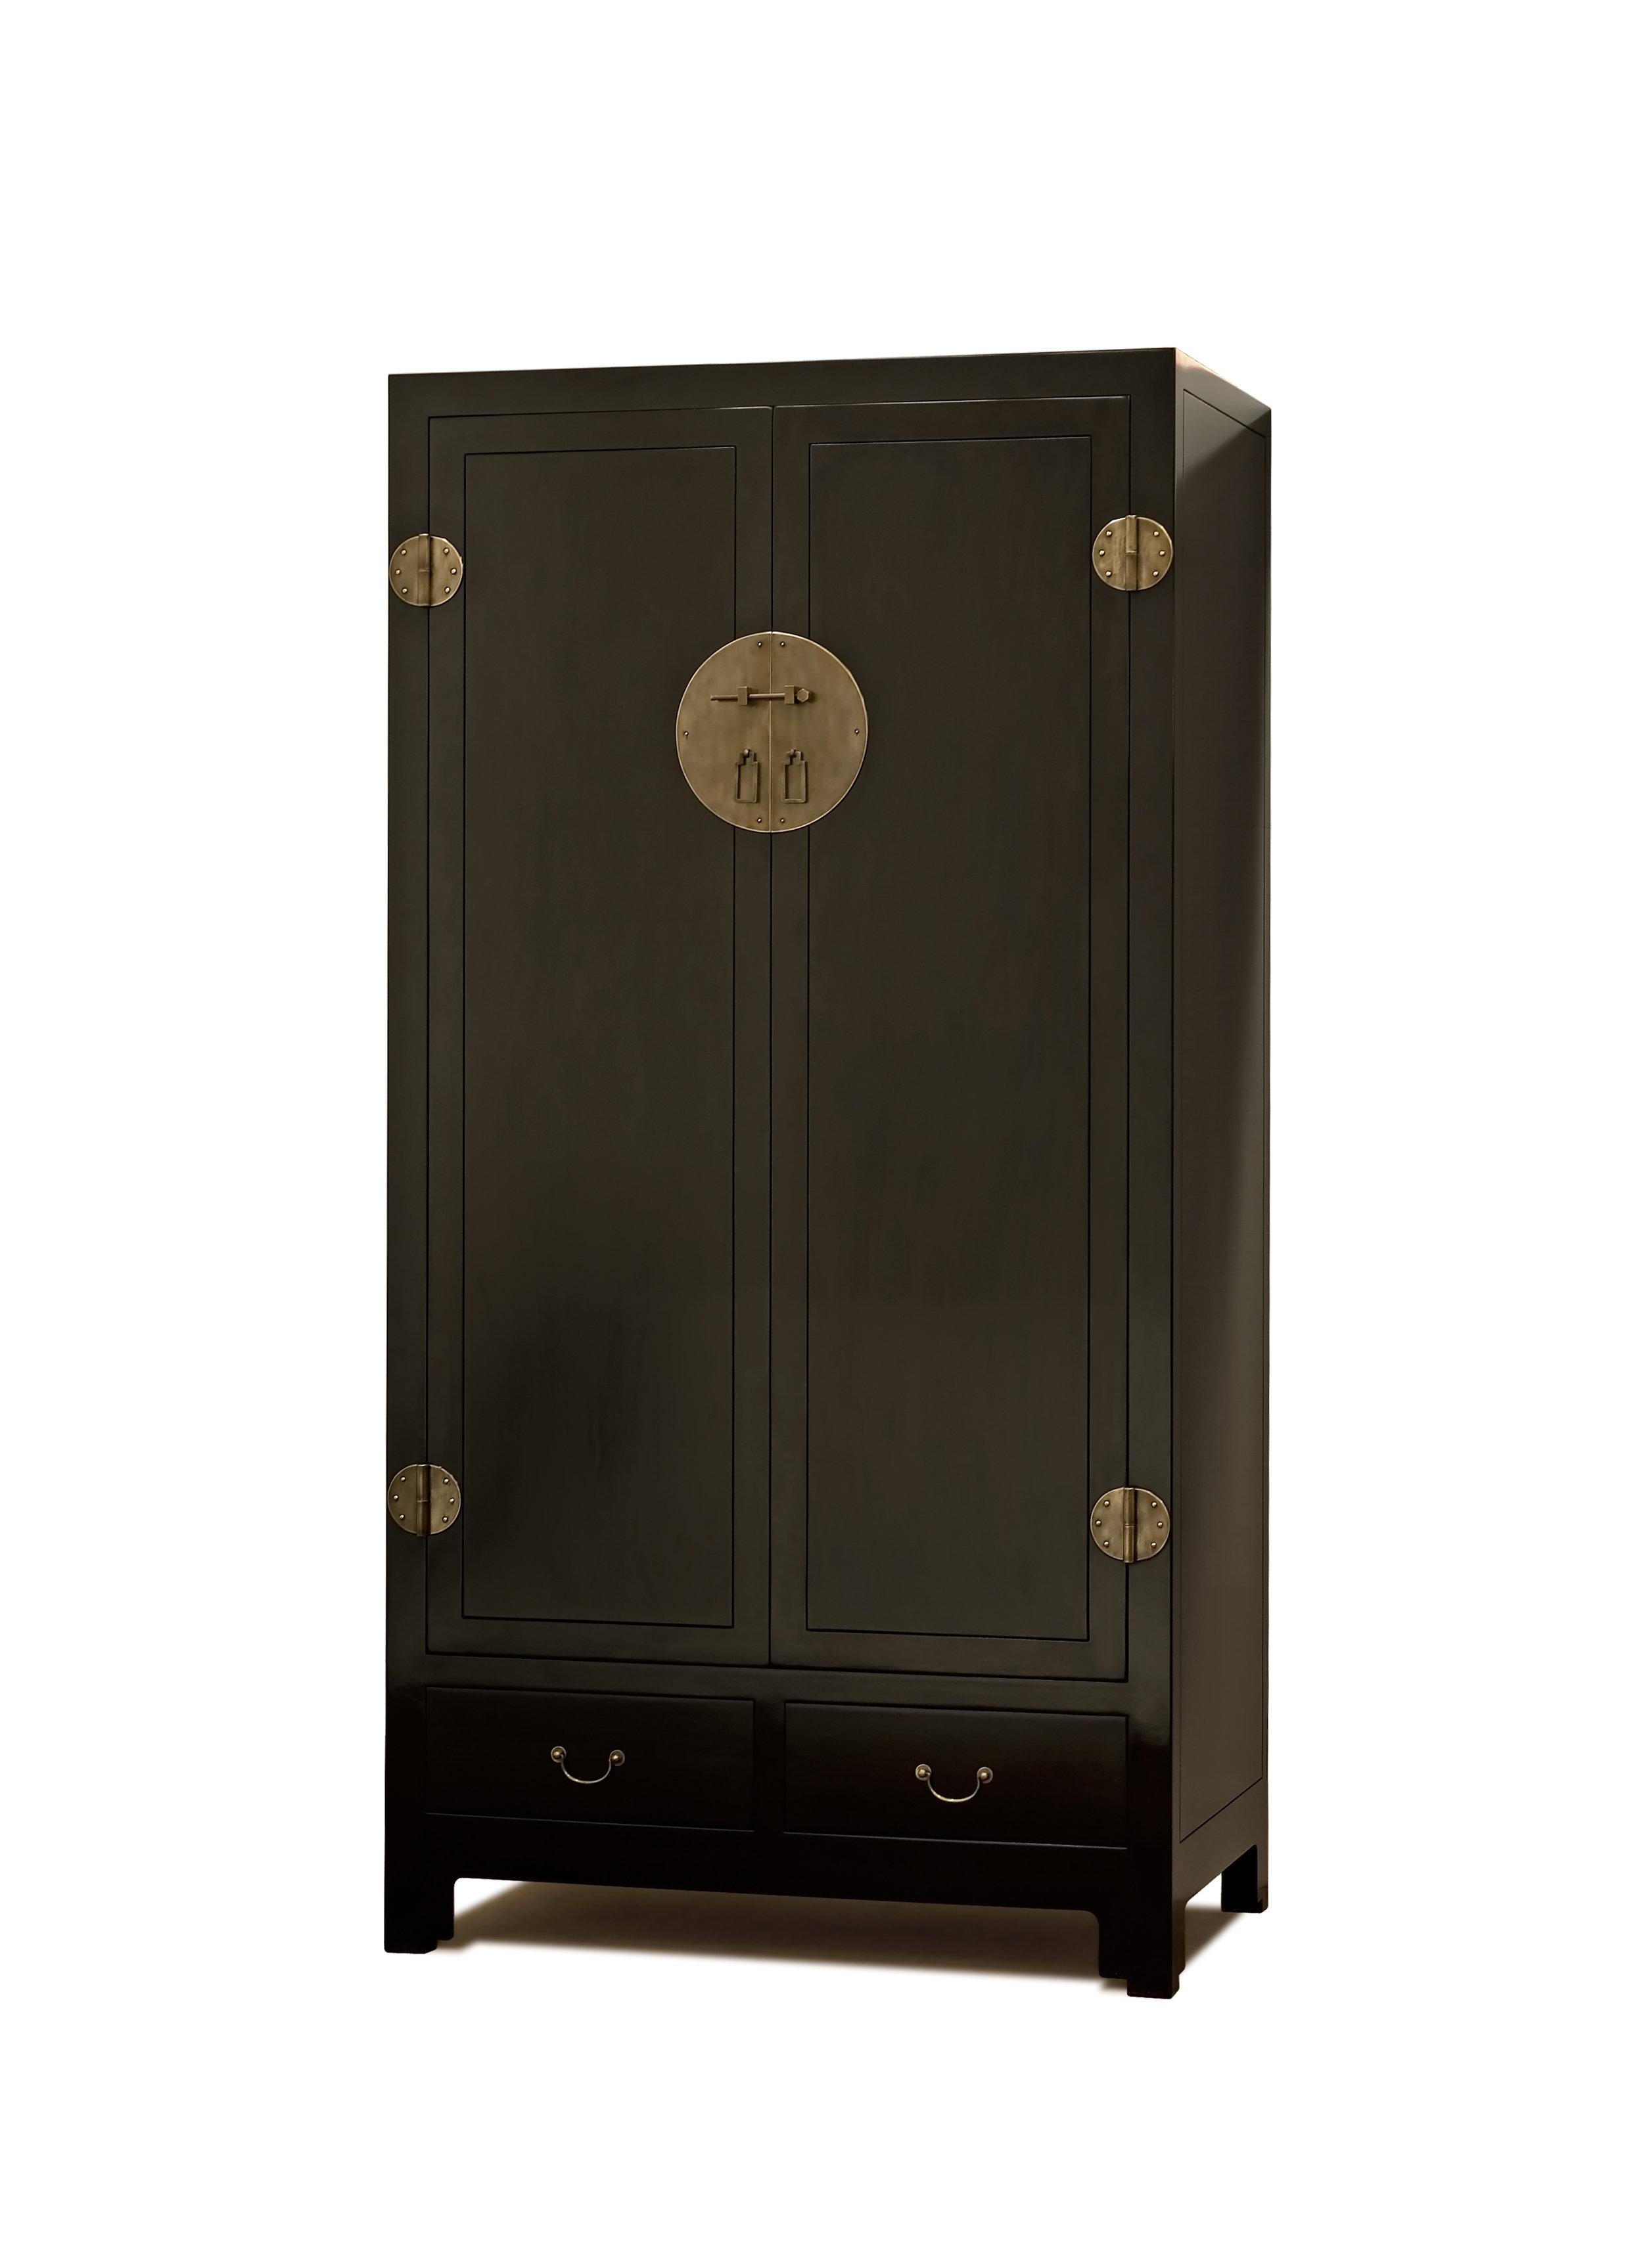 ....chinese ming style furniture : wardrobe ..中式明式家具 : 衣柜....